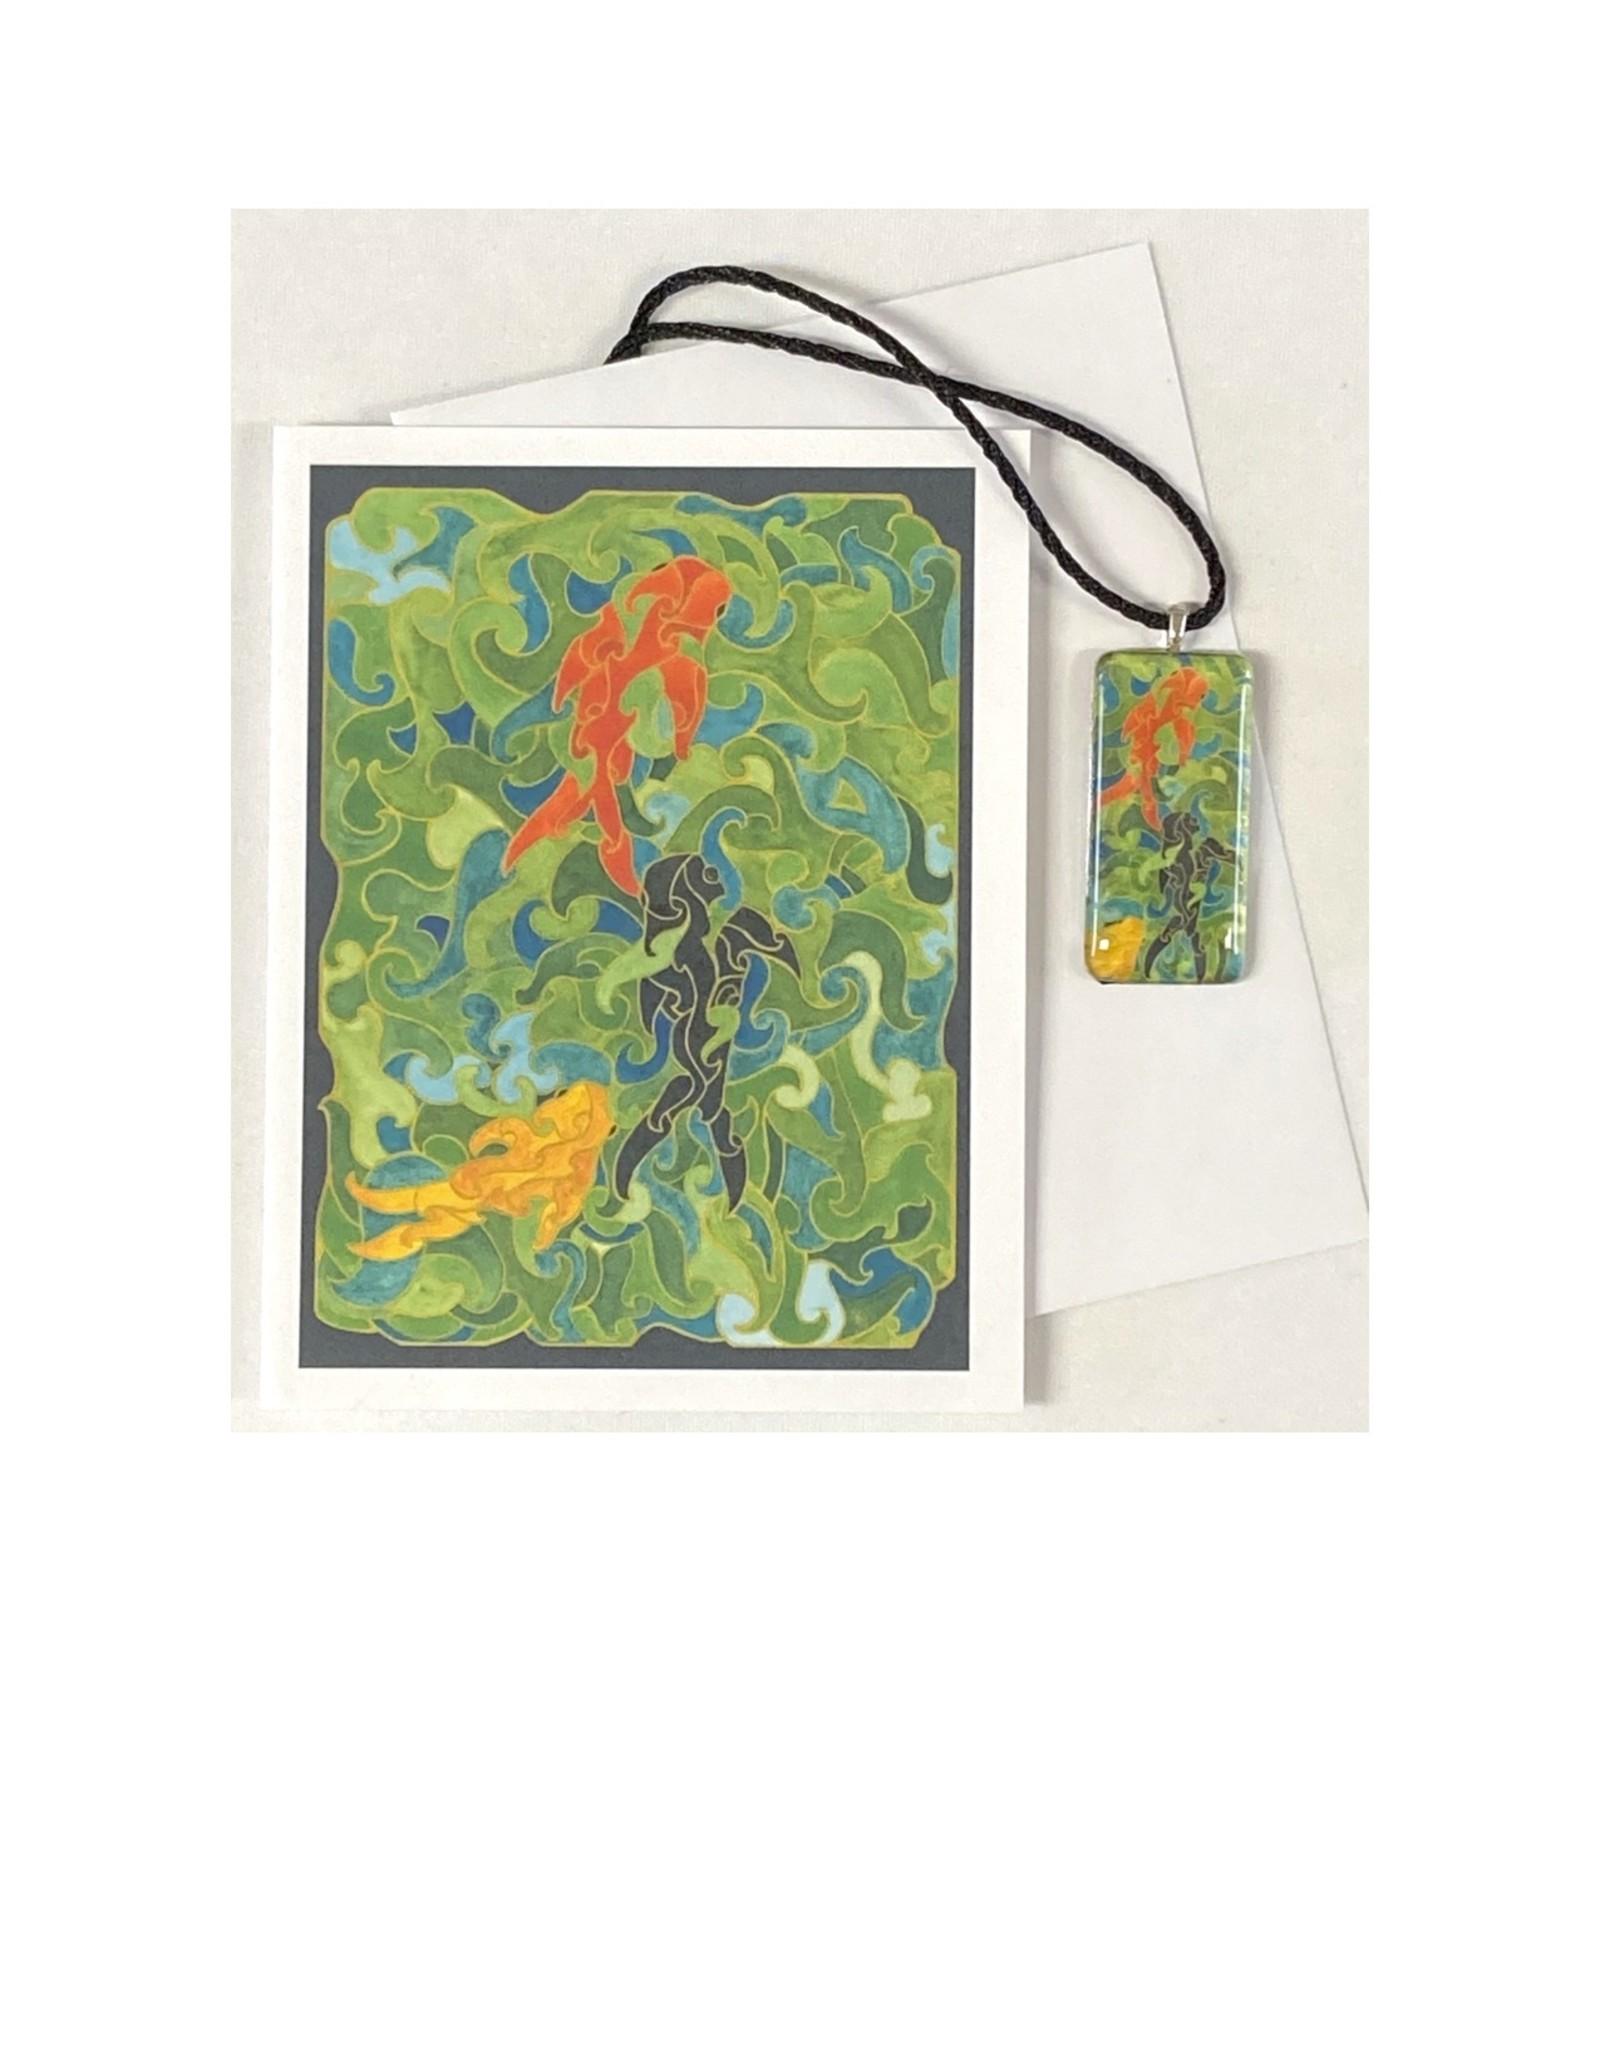 Kelly Casperson Three Koi pendant & card set